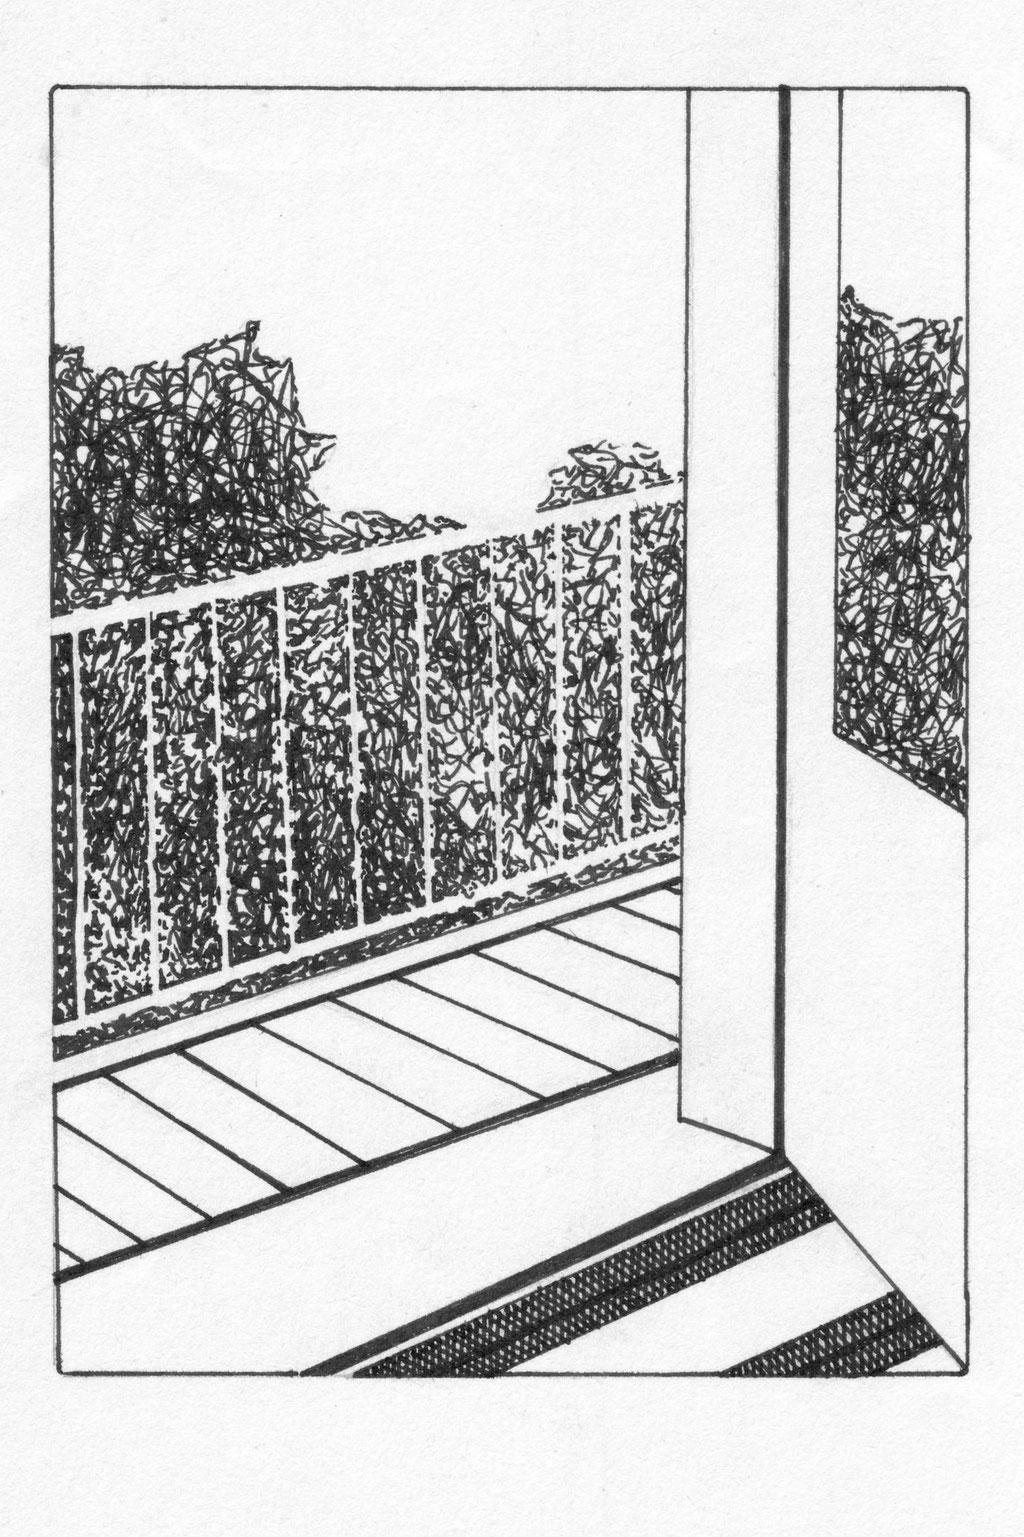 balcony (Vienna), ink on paper, 15x10,7cm